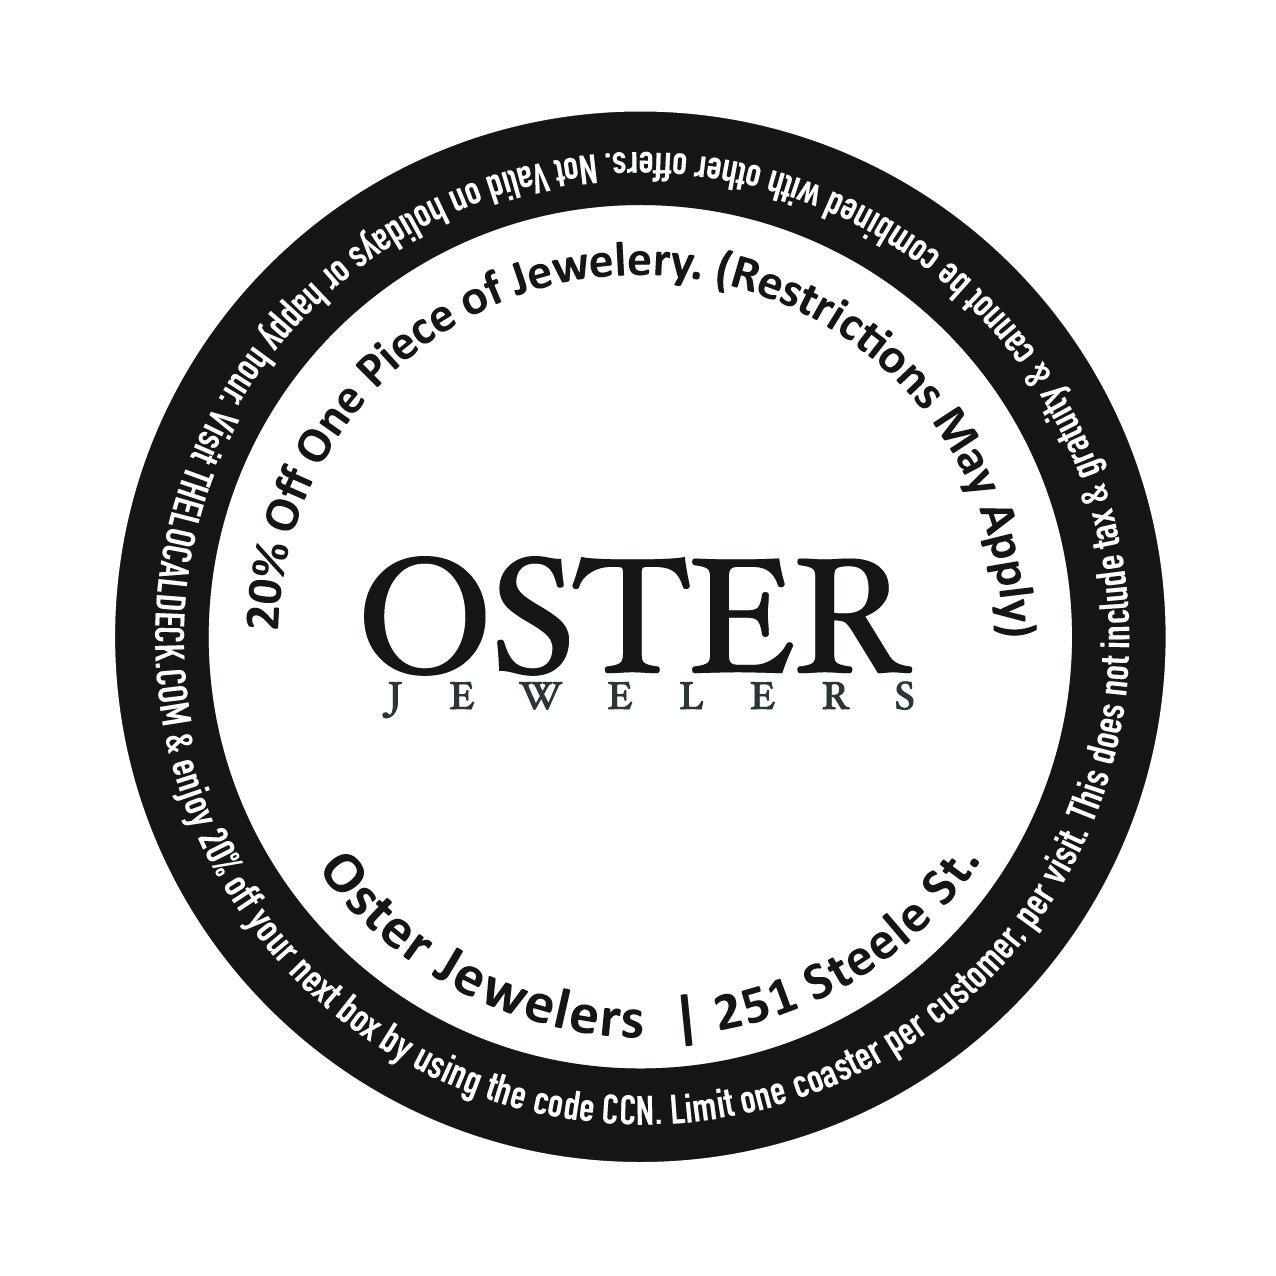 Oster Jewelers NEW-30.jpg